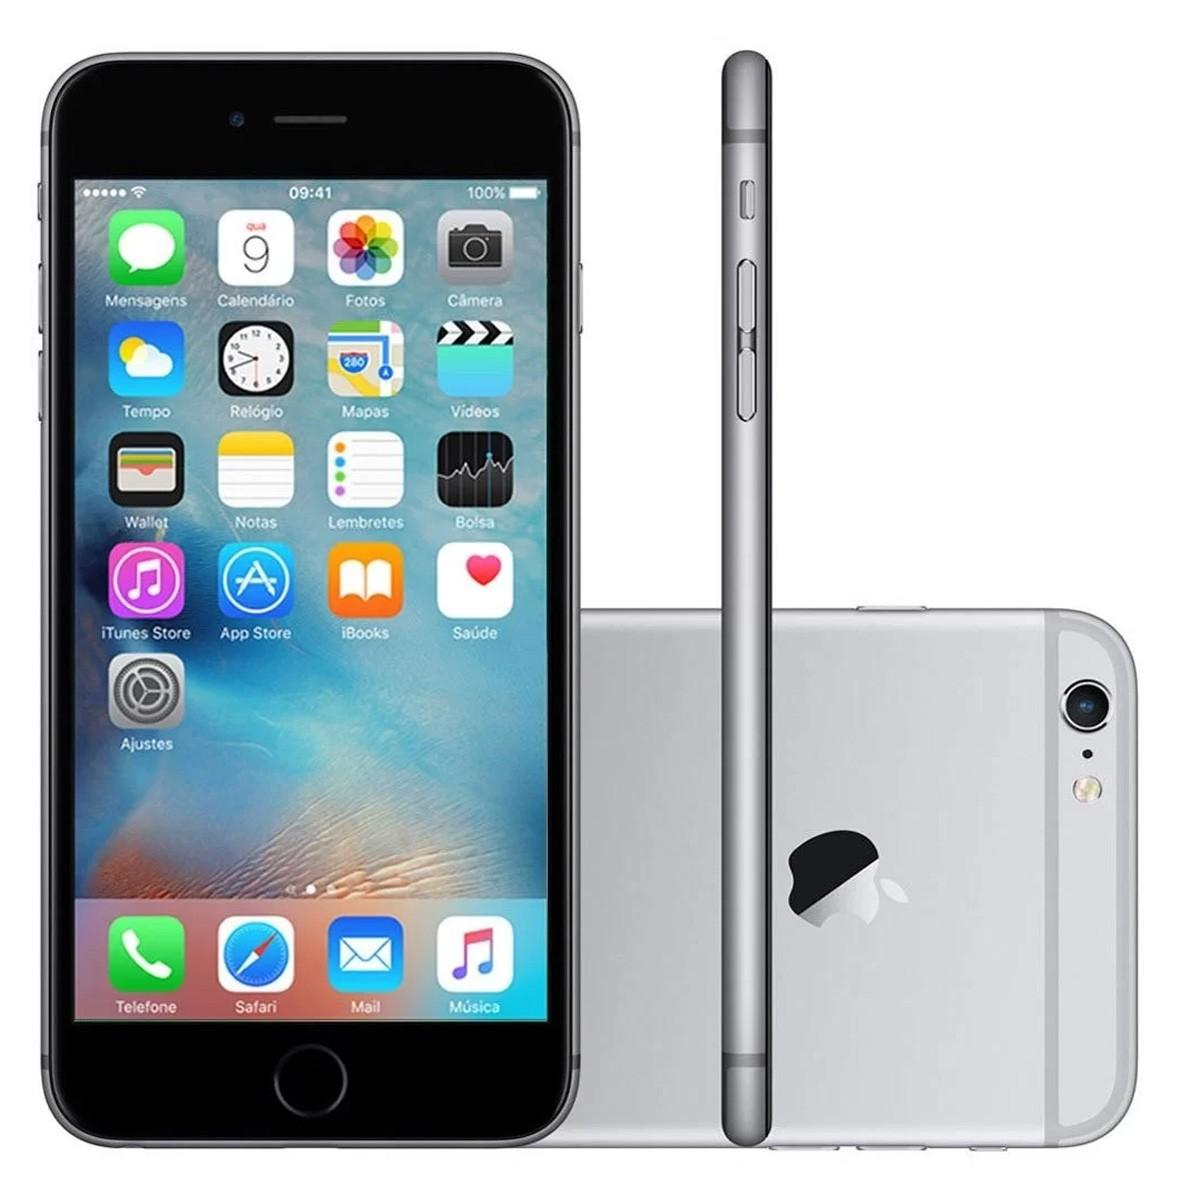 Smartphone Apple iPhone 6 64GB Tela 4.7' 8MP 4G (Open Box)